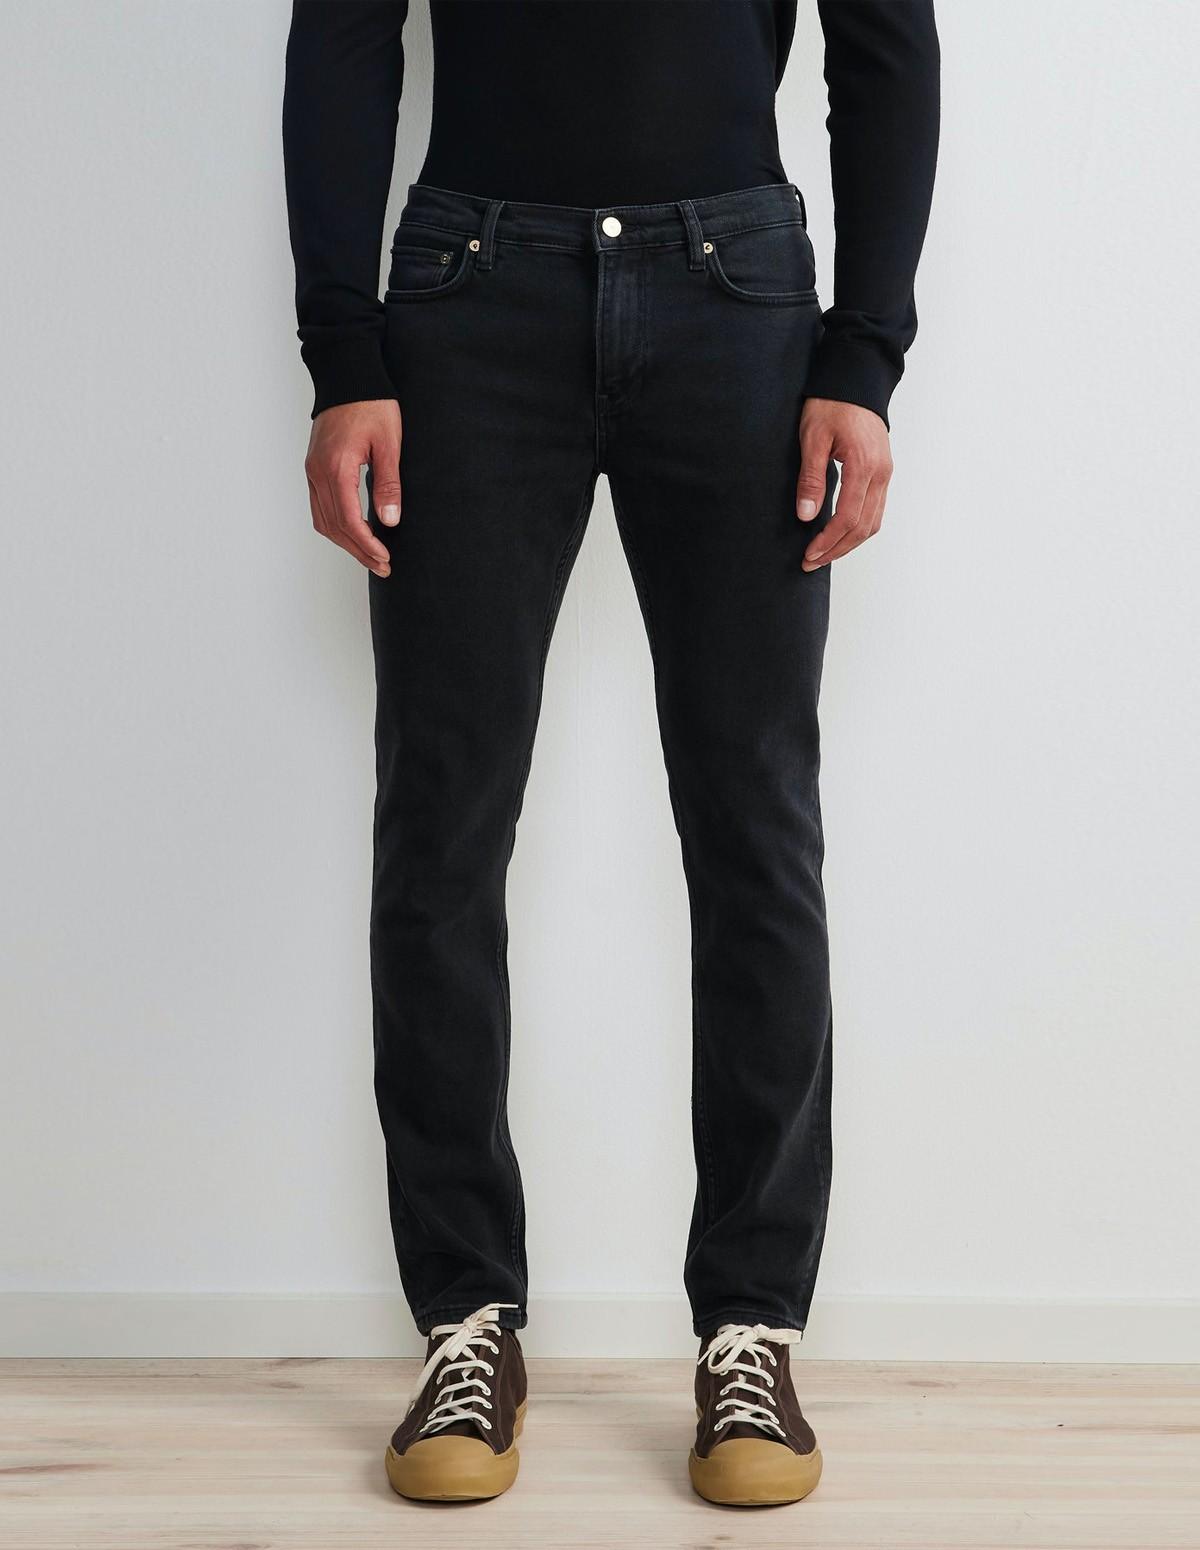 Nn07 Slater Slim Jeans - 909 GREY DENIM